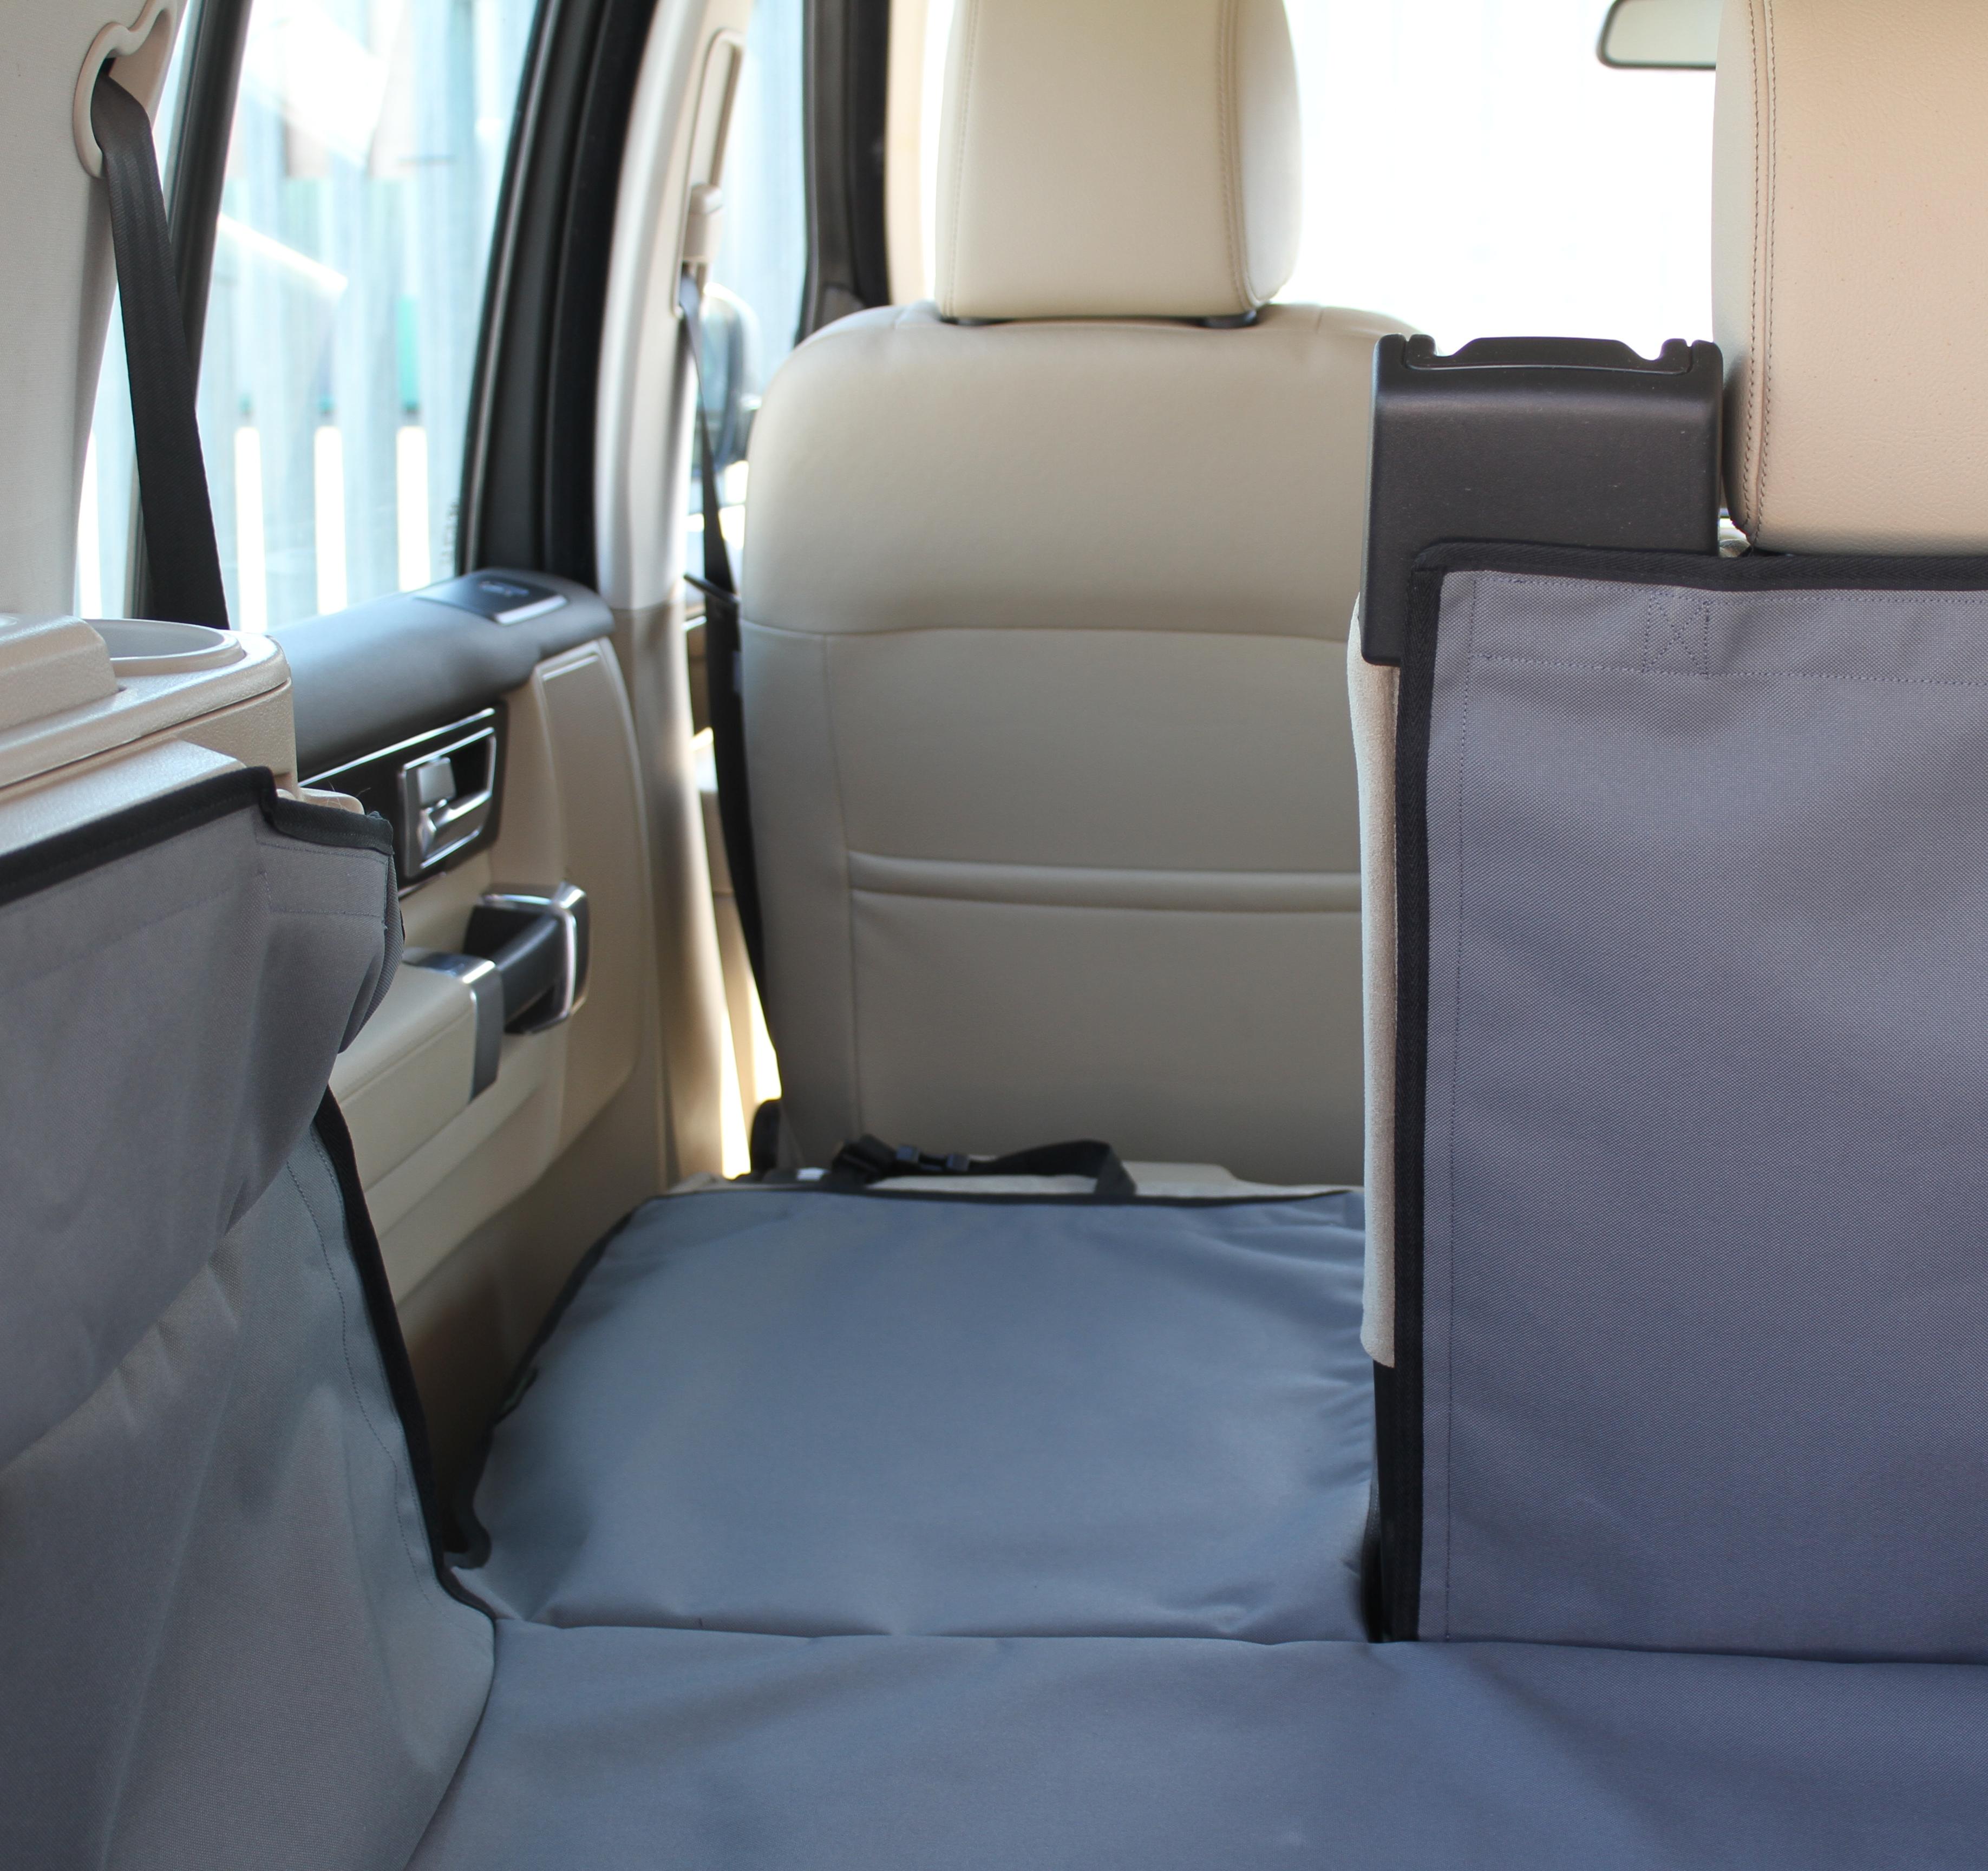 Hyundai i10 2014 Onwards Custom Boot Liner